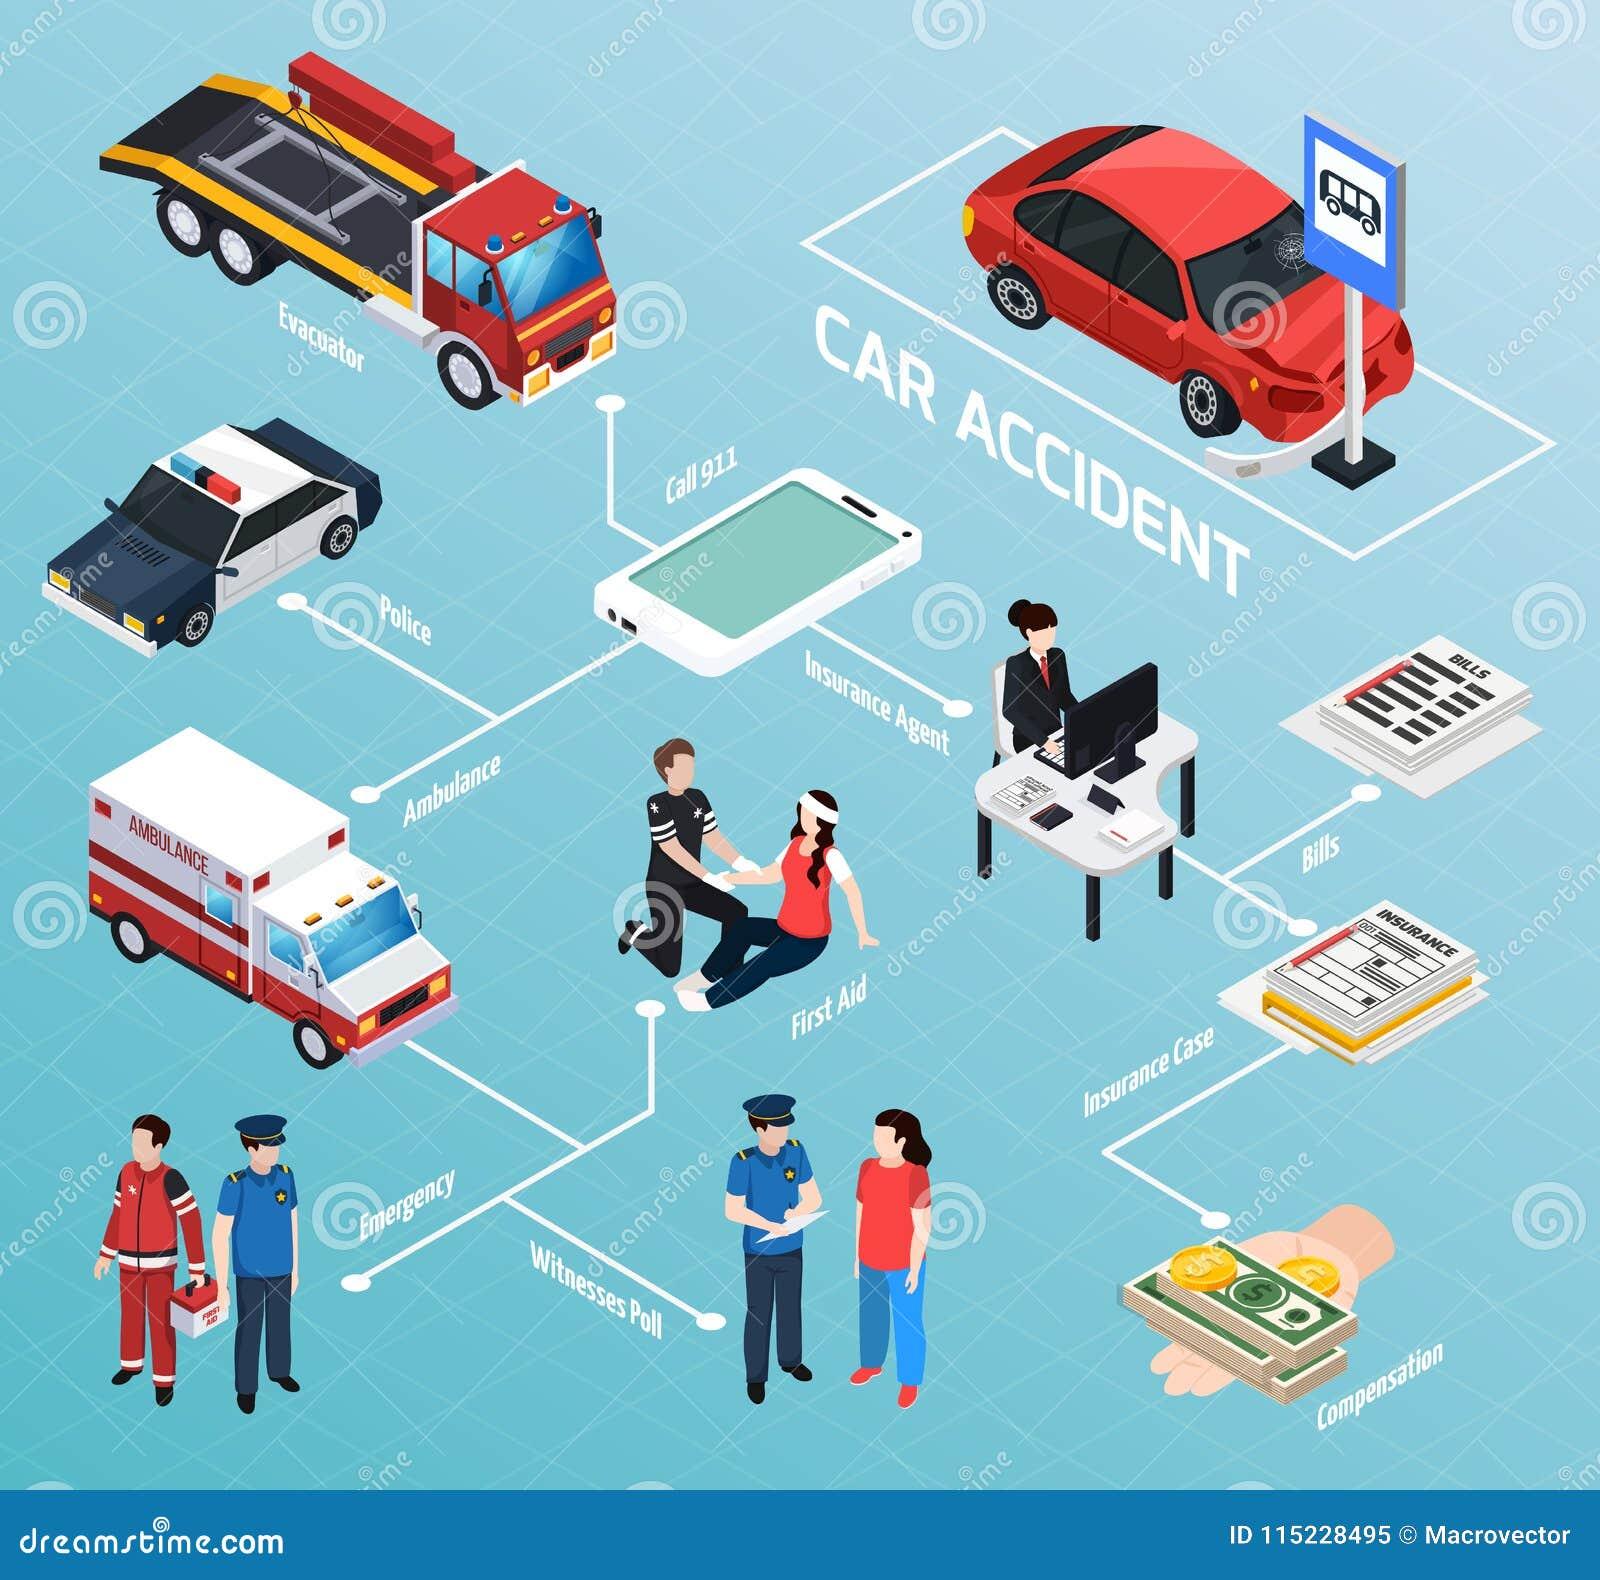 Car Accident Isometric Flowchart